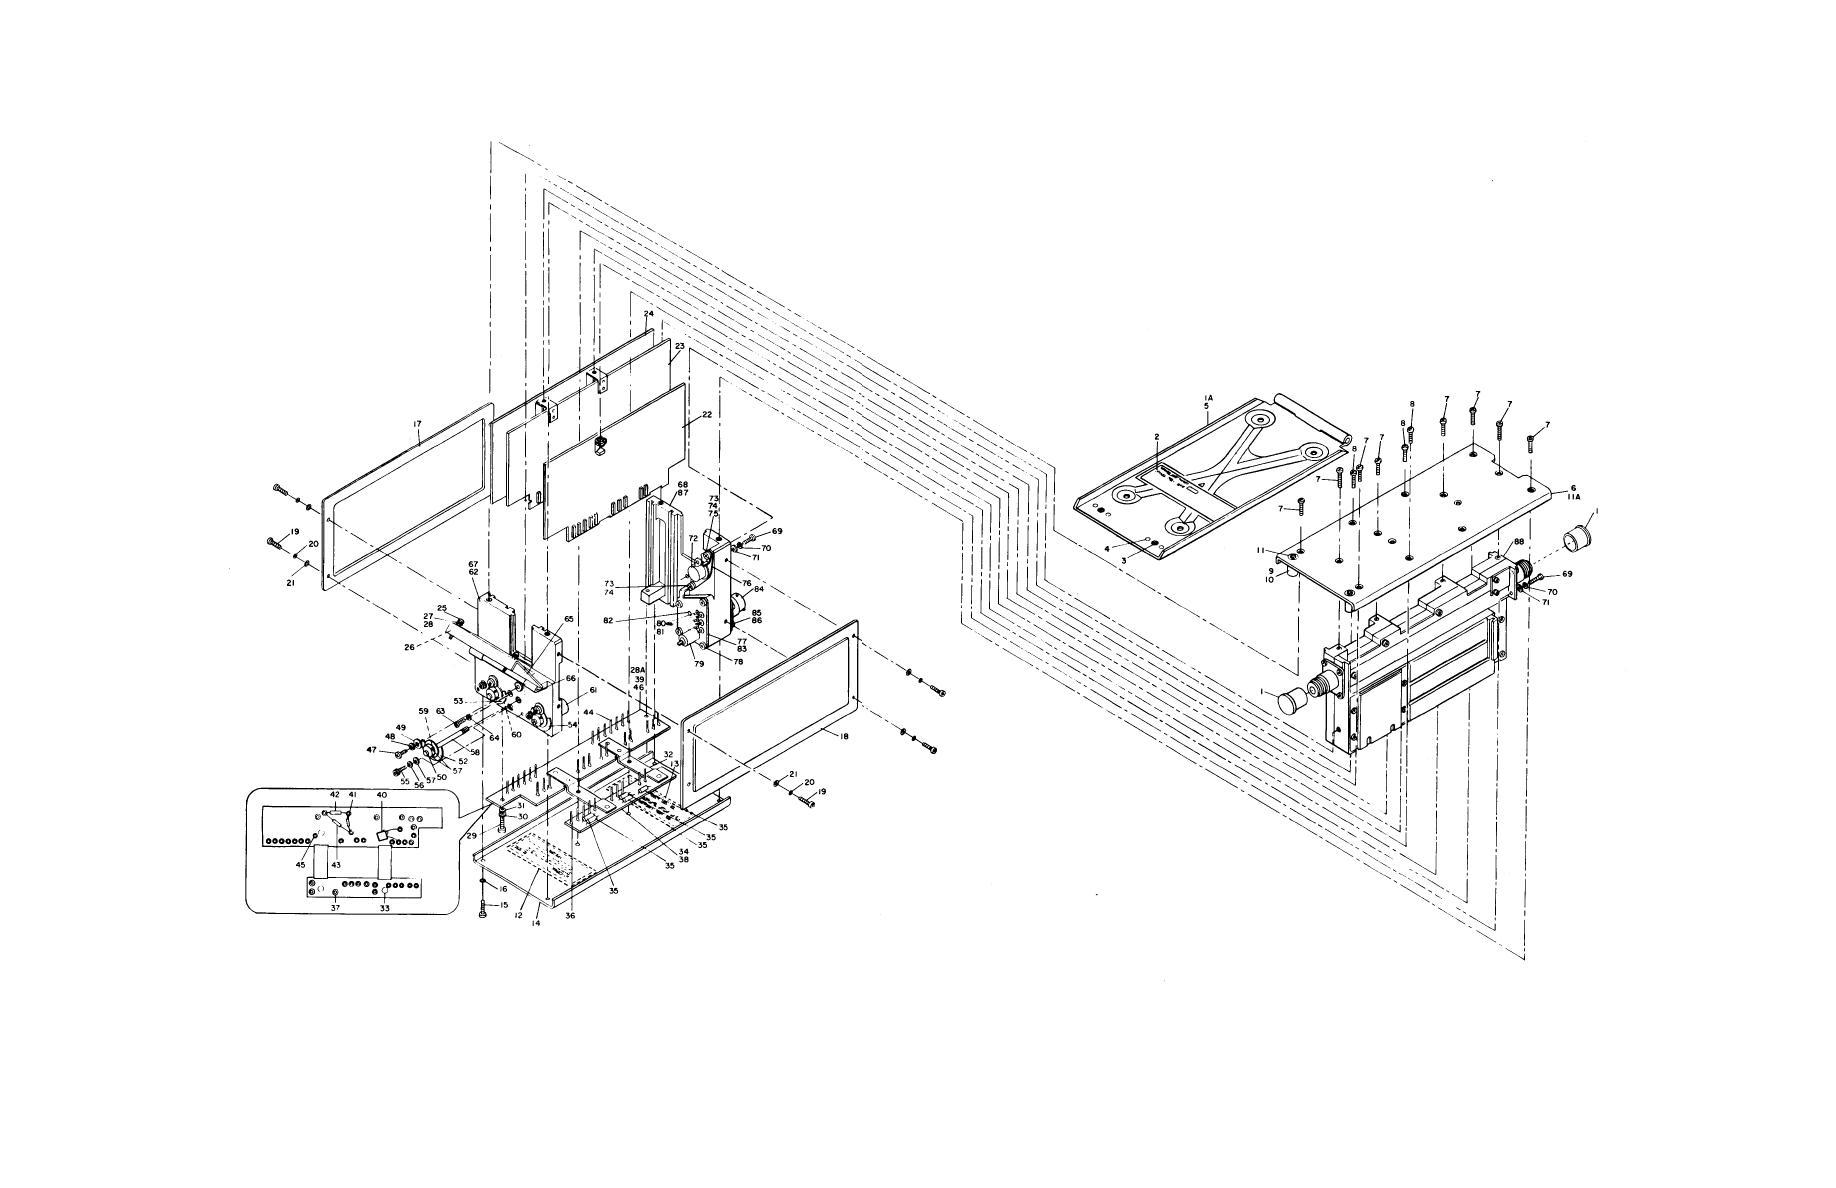 Figure 11-1. Test Set, Transponder Set TS-1843A/APX